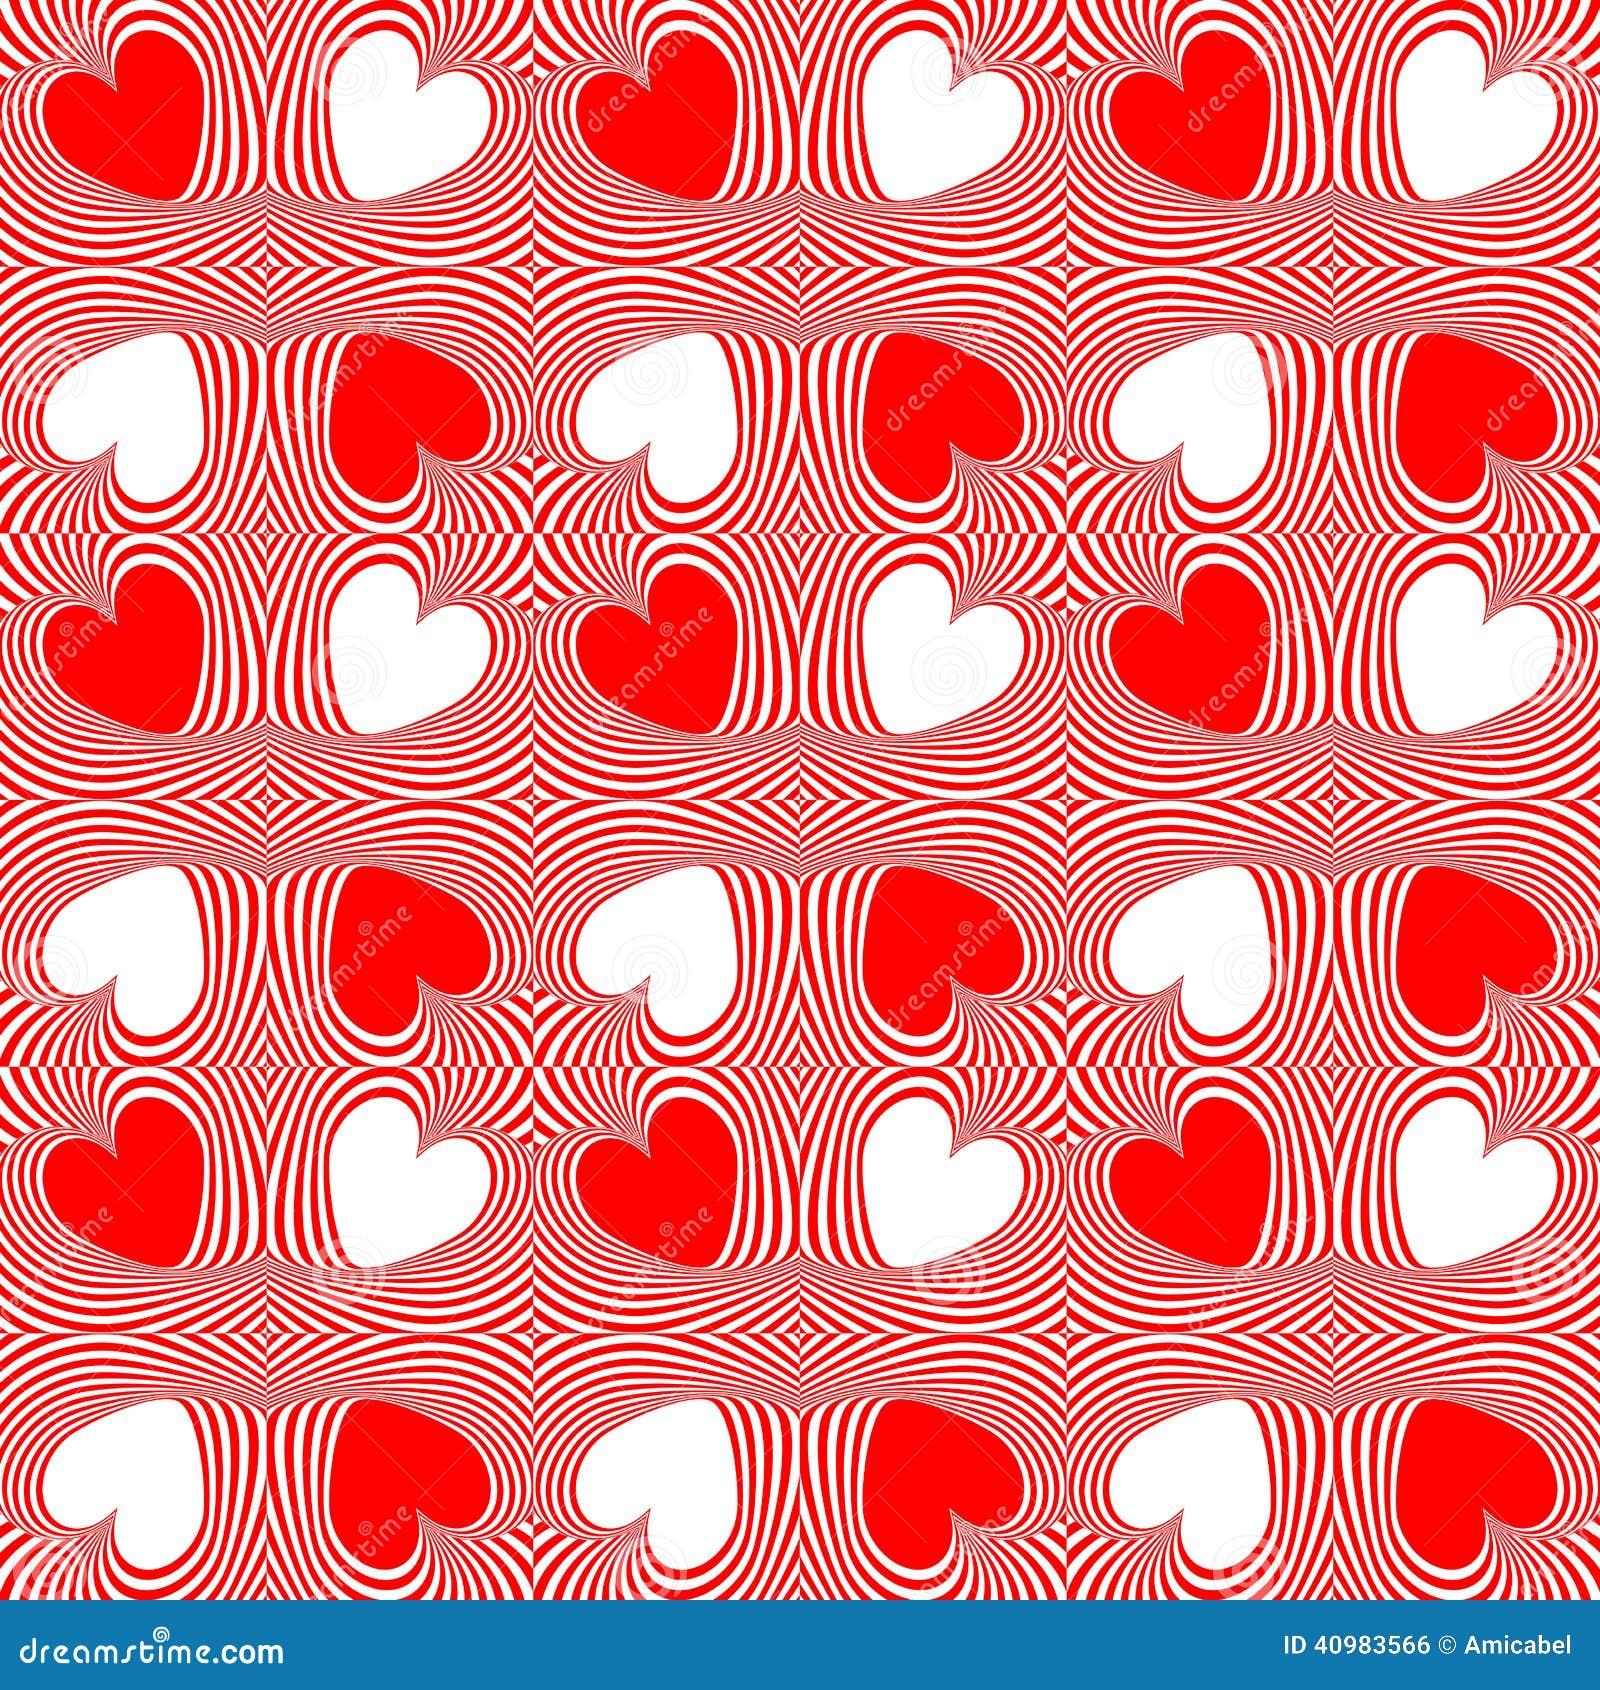 Design seamless twirl movement heart pattern